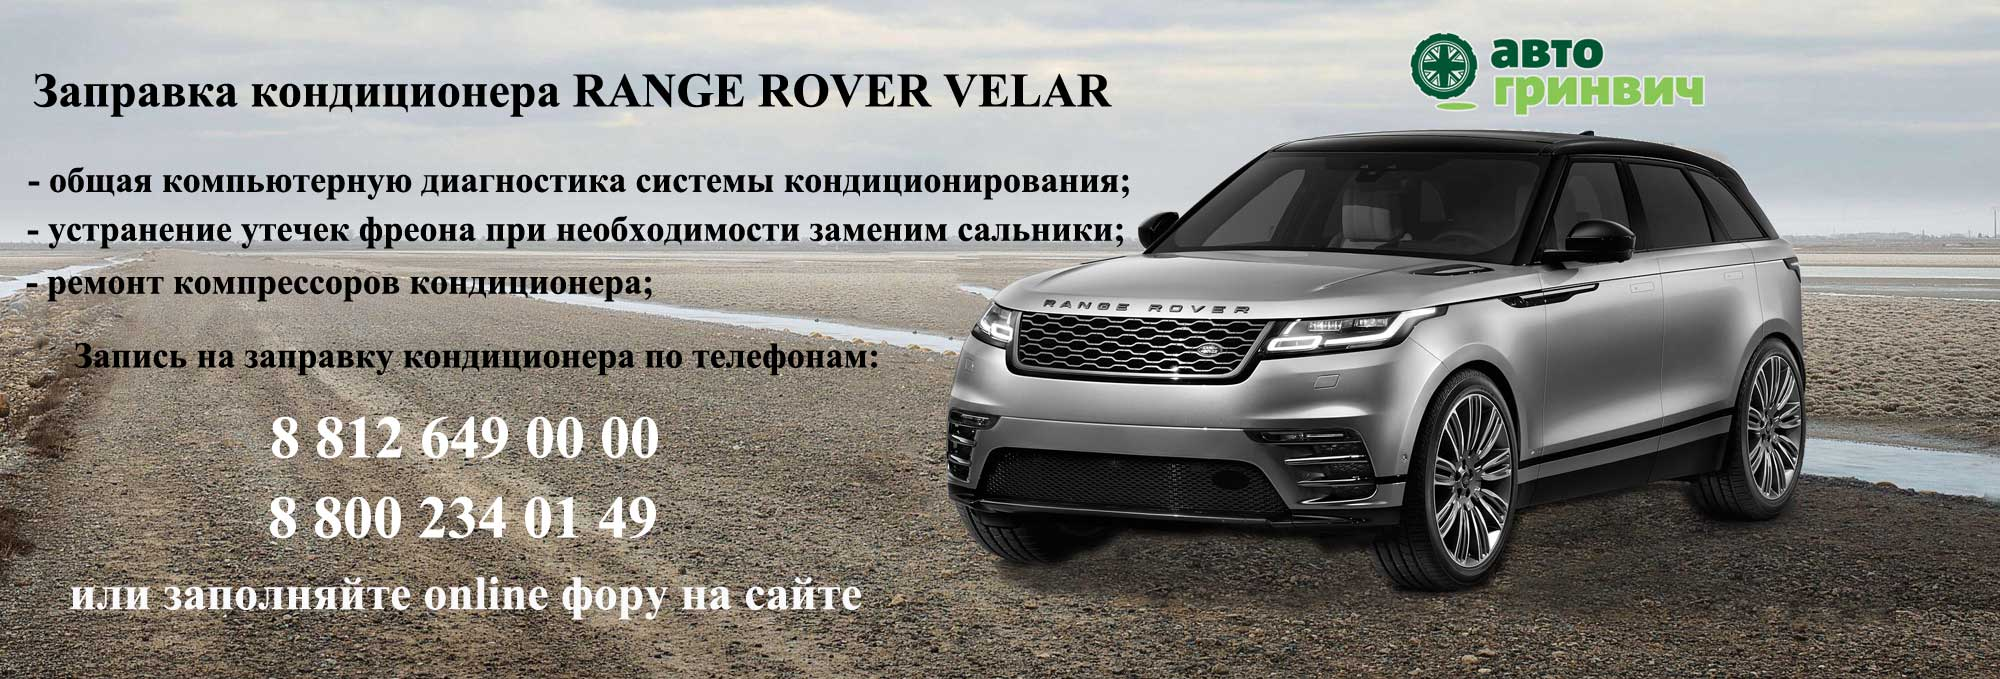 Заправка кондиционера Range Rover Velar